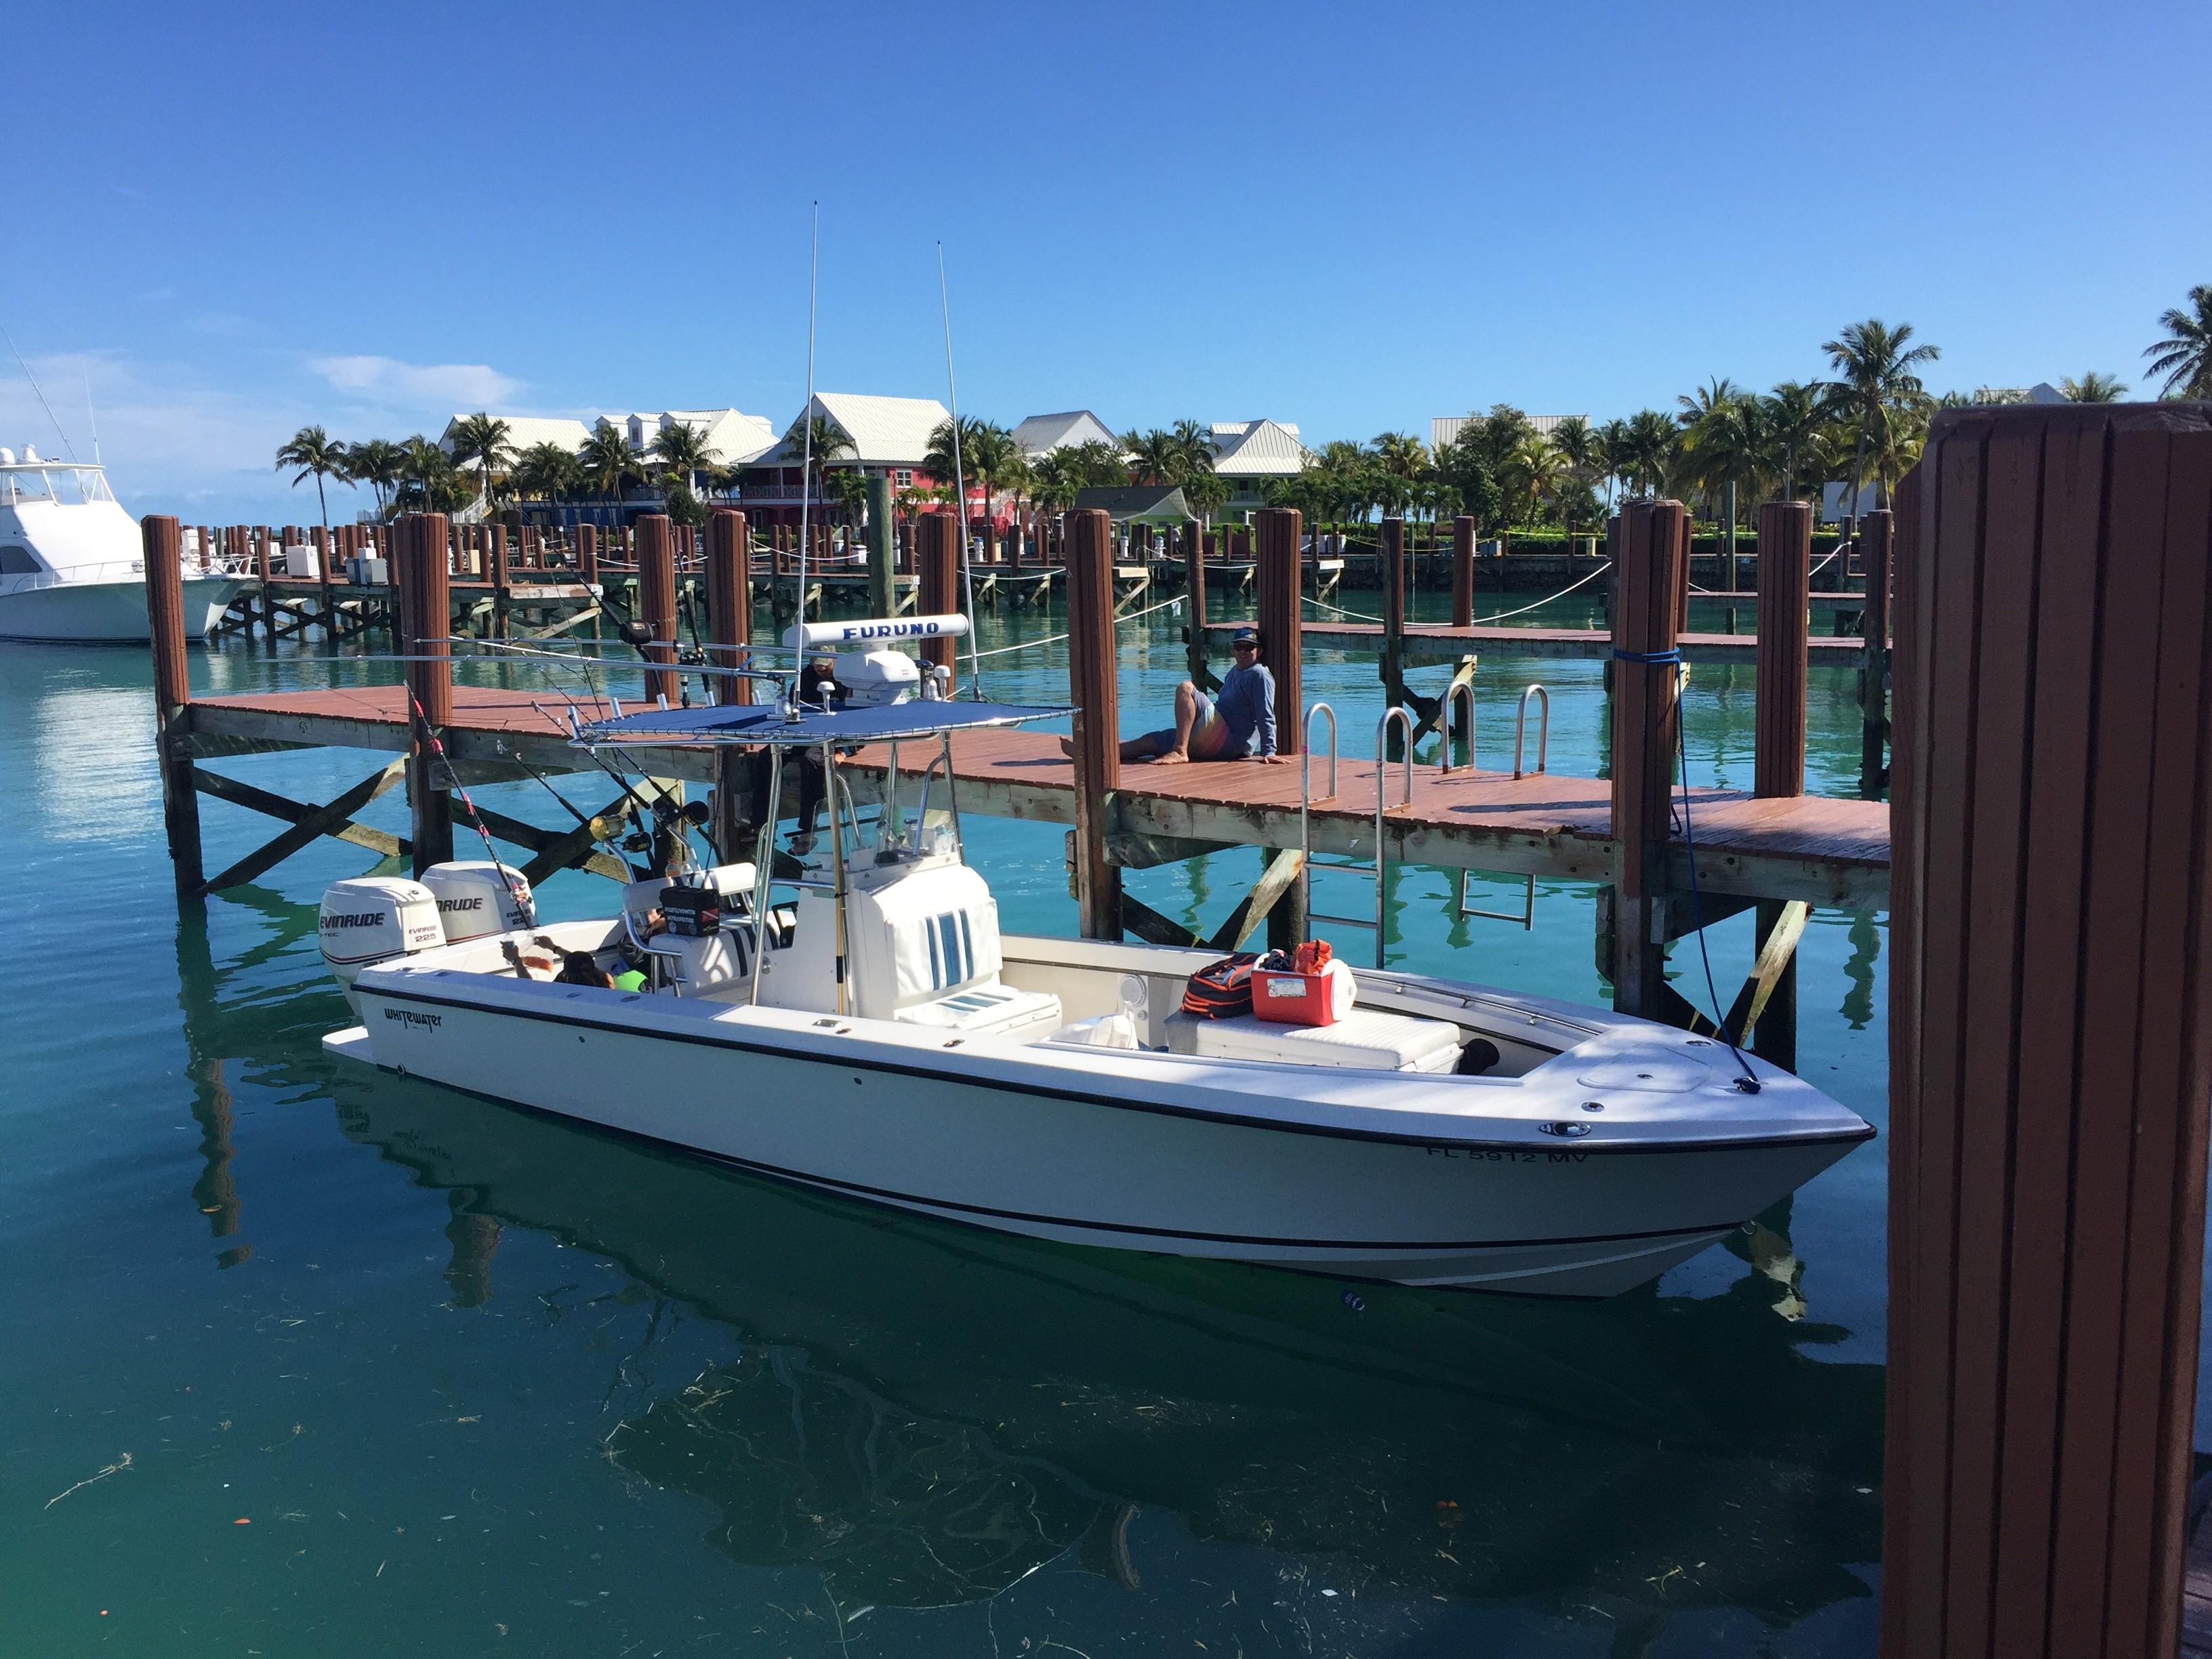 New Boat 8.jpg